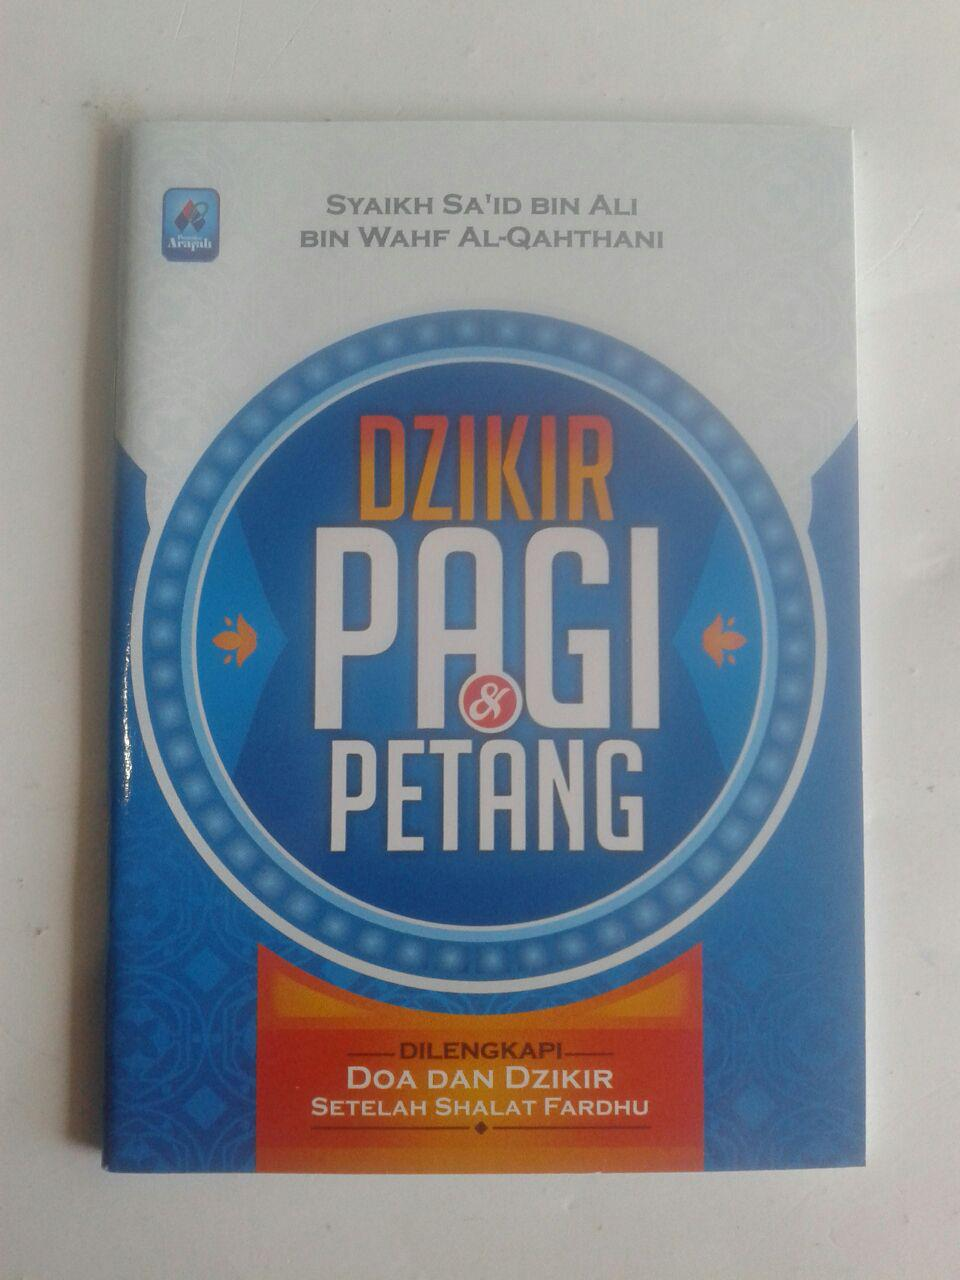 Buku Saku Dzikir Pagi Dan Petang Dilengkapi Doa Dzikir Shalat cover 2